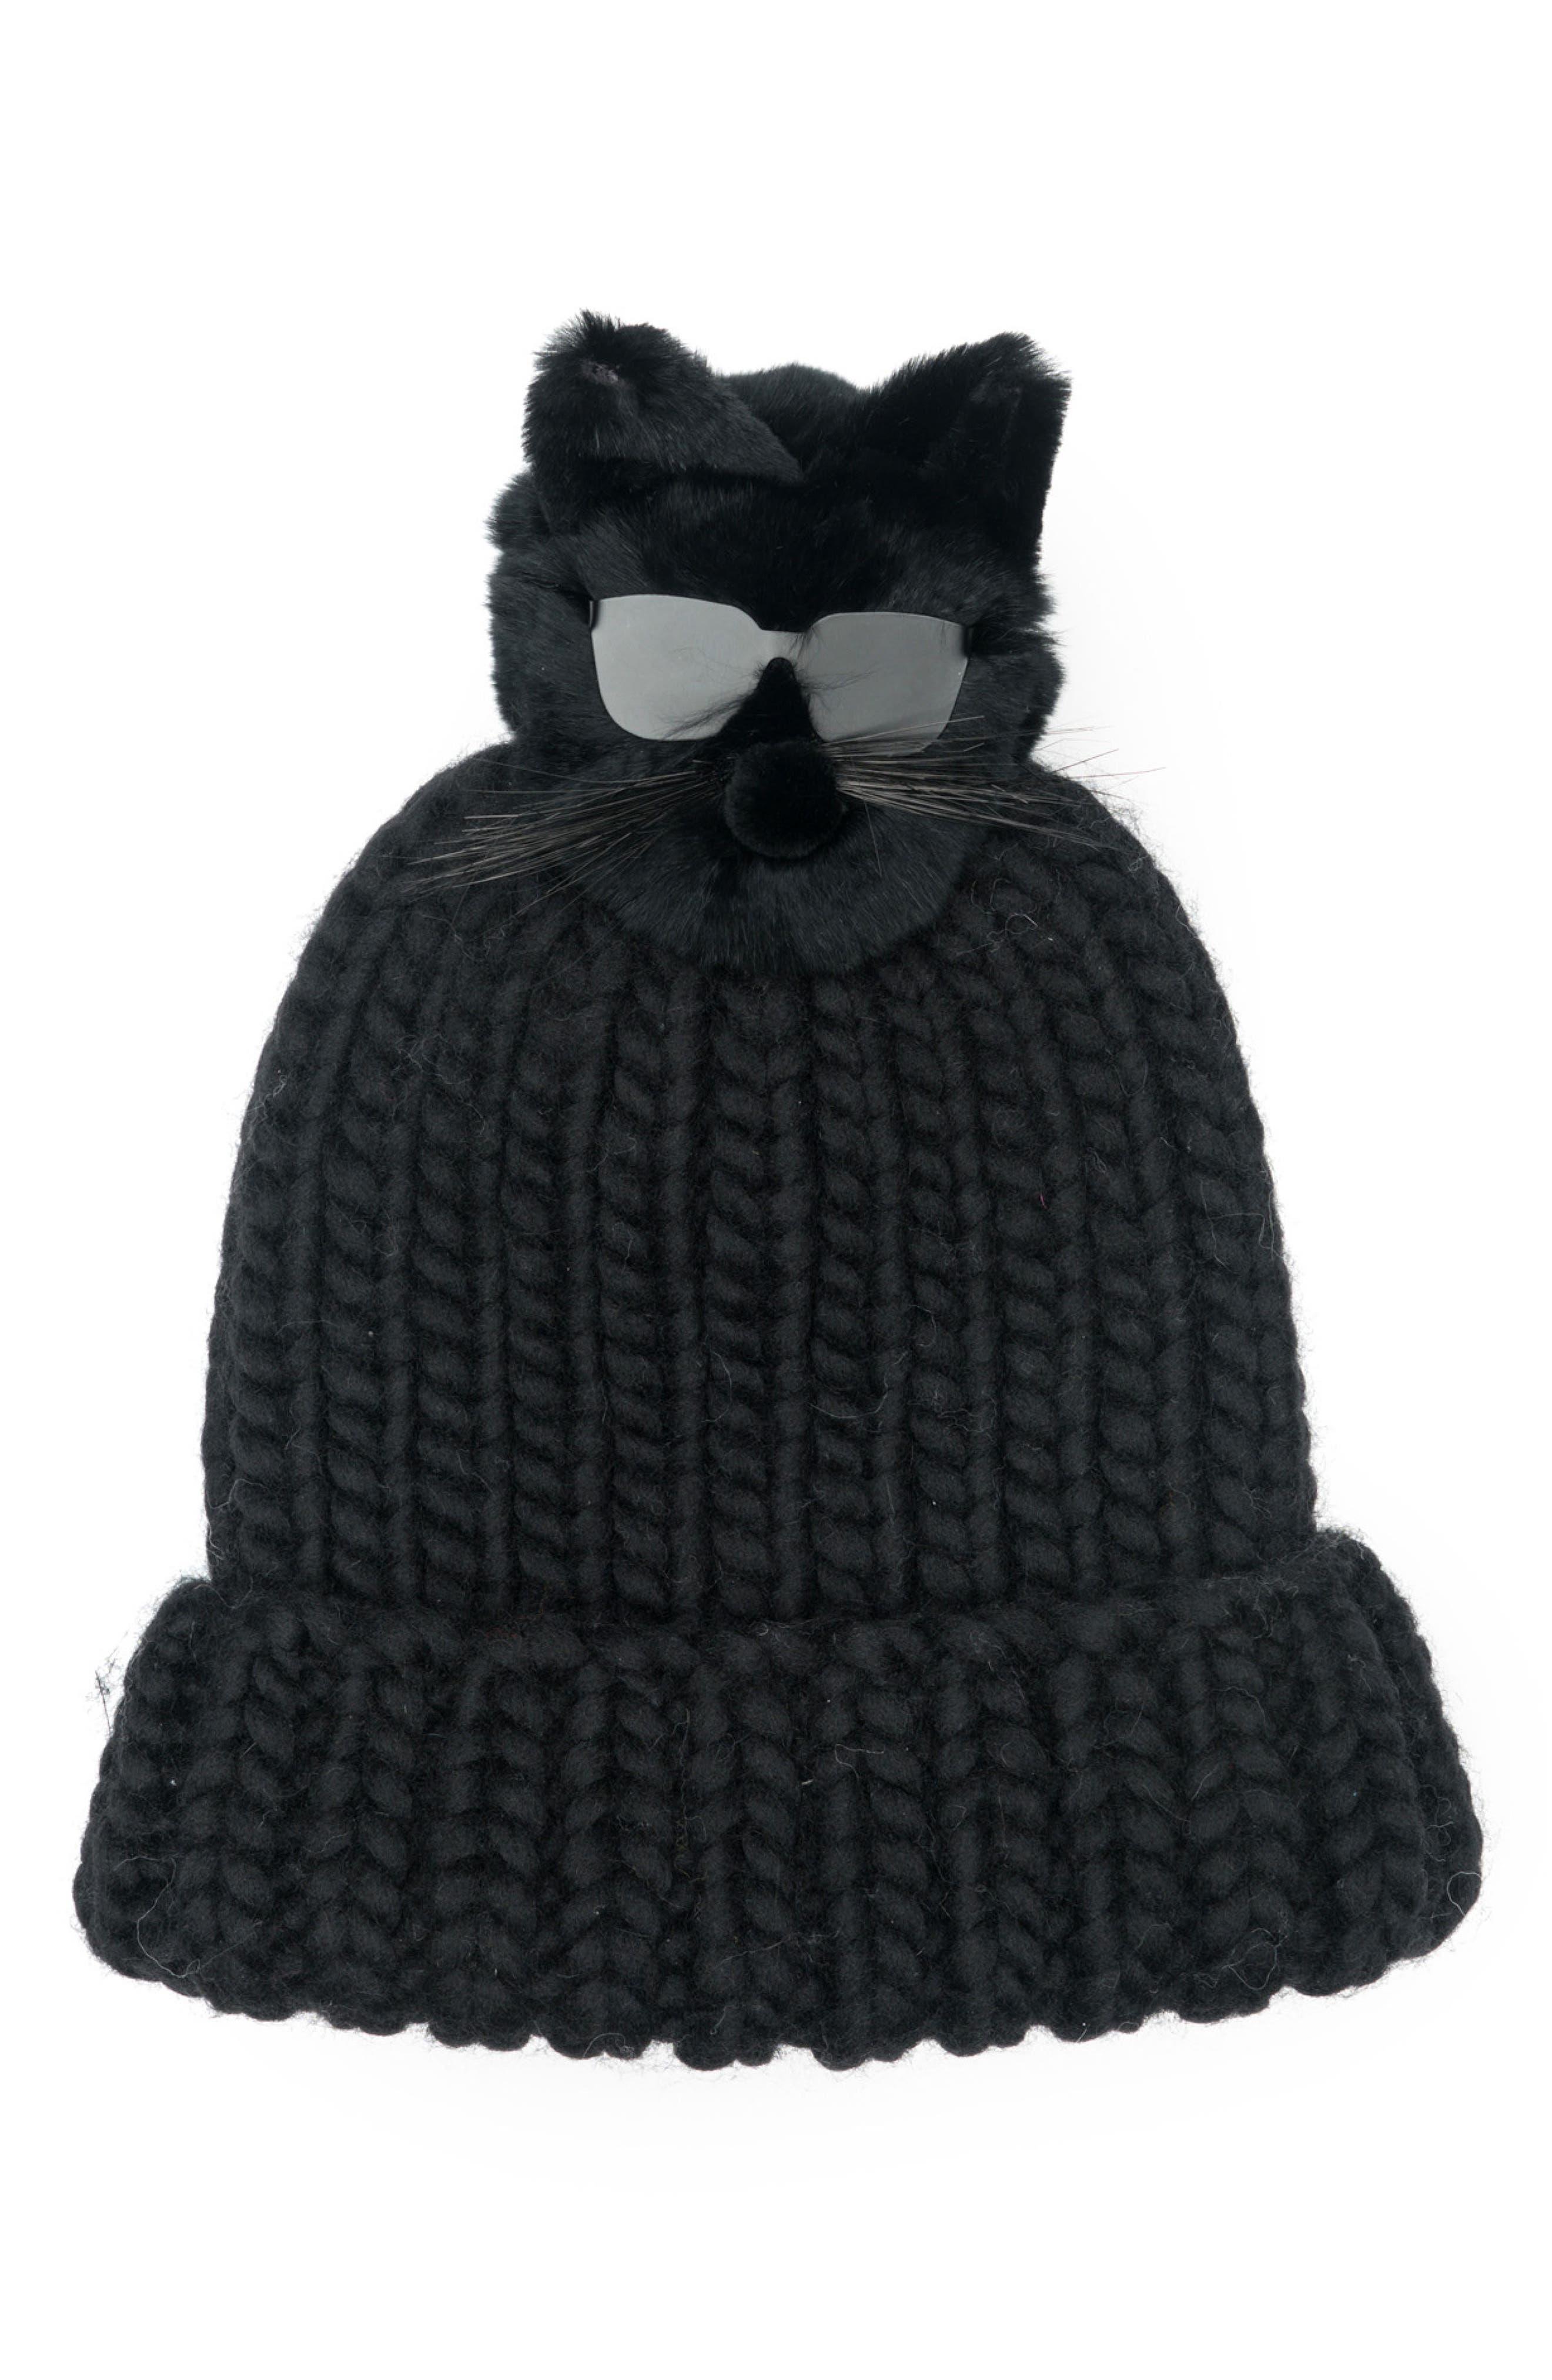 Rain Wool Stocking Cap with Genuine Fox Fur Pom,                         Main,                         color, 001